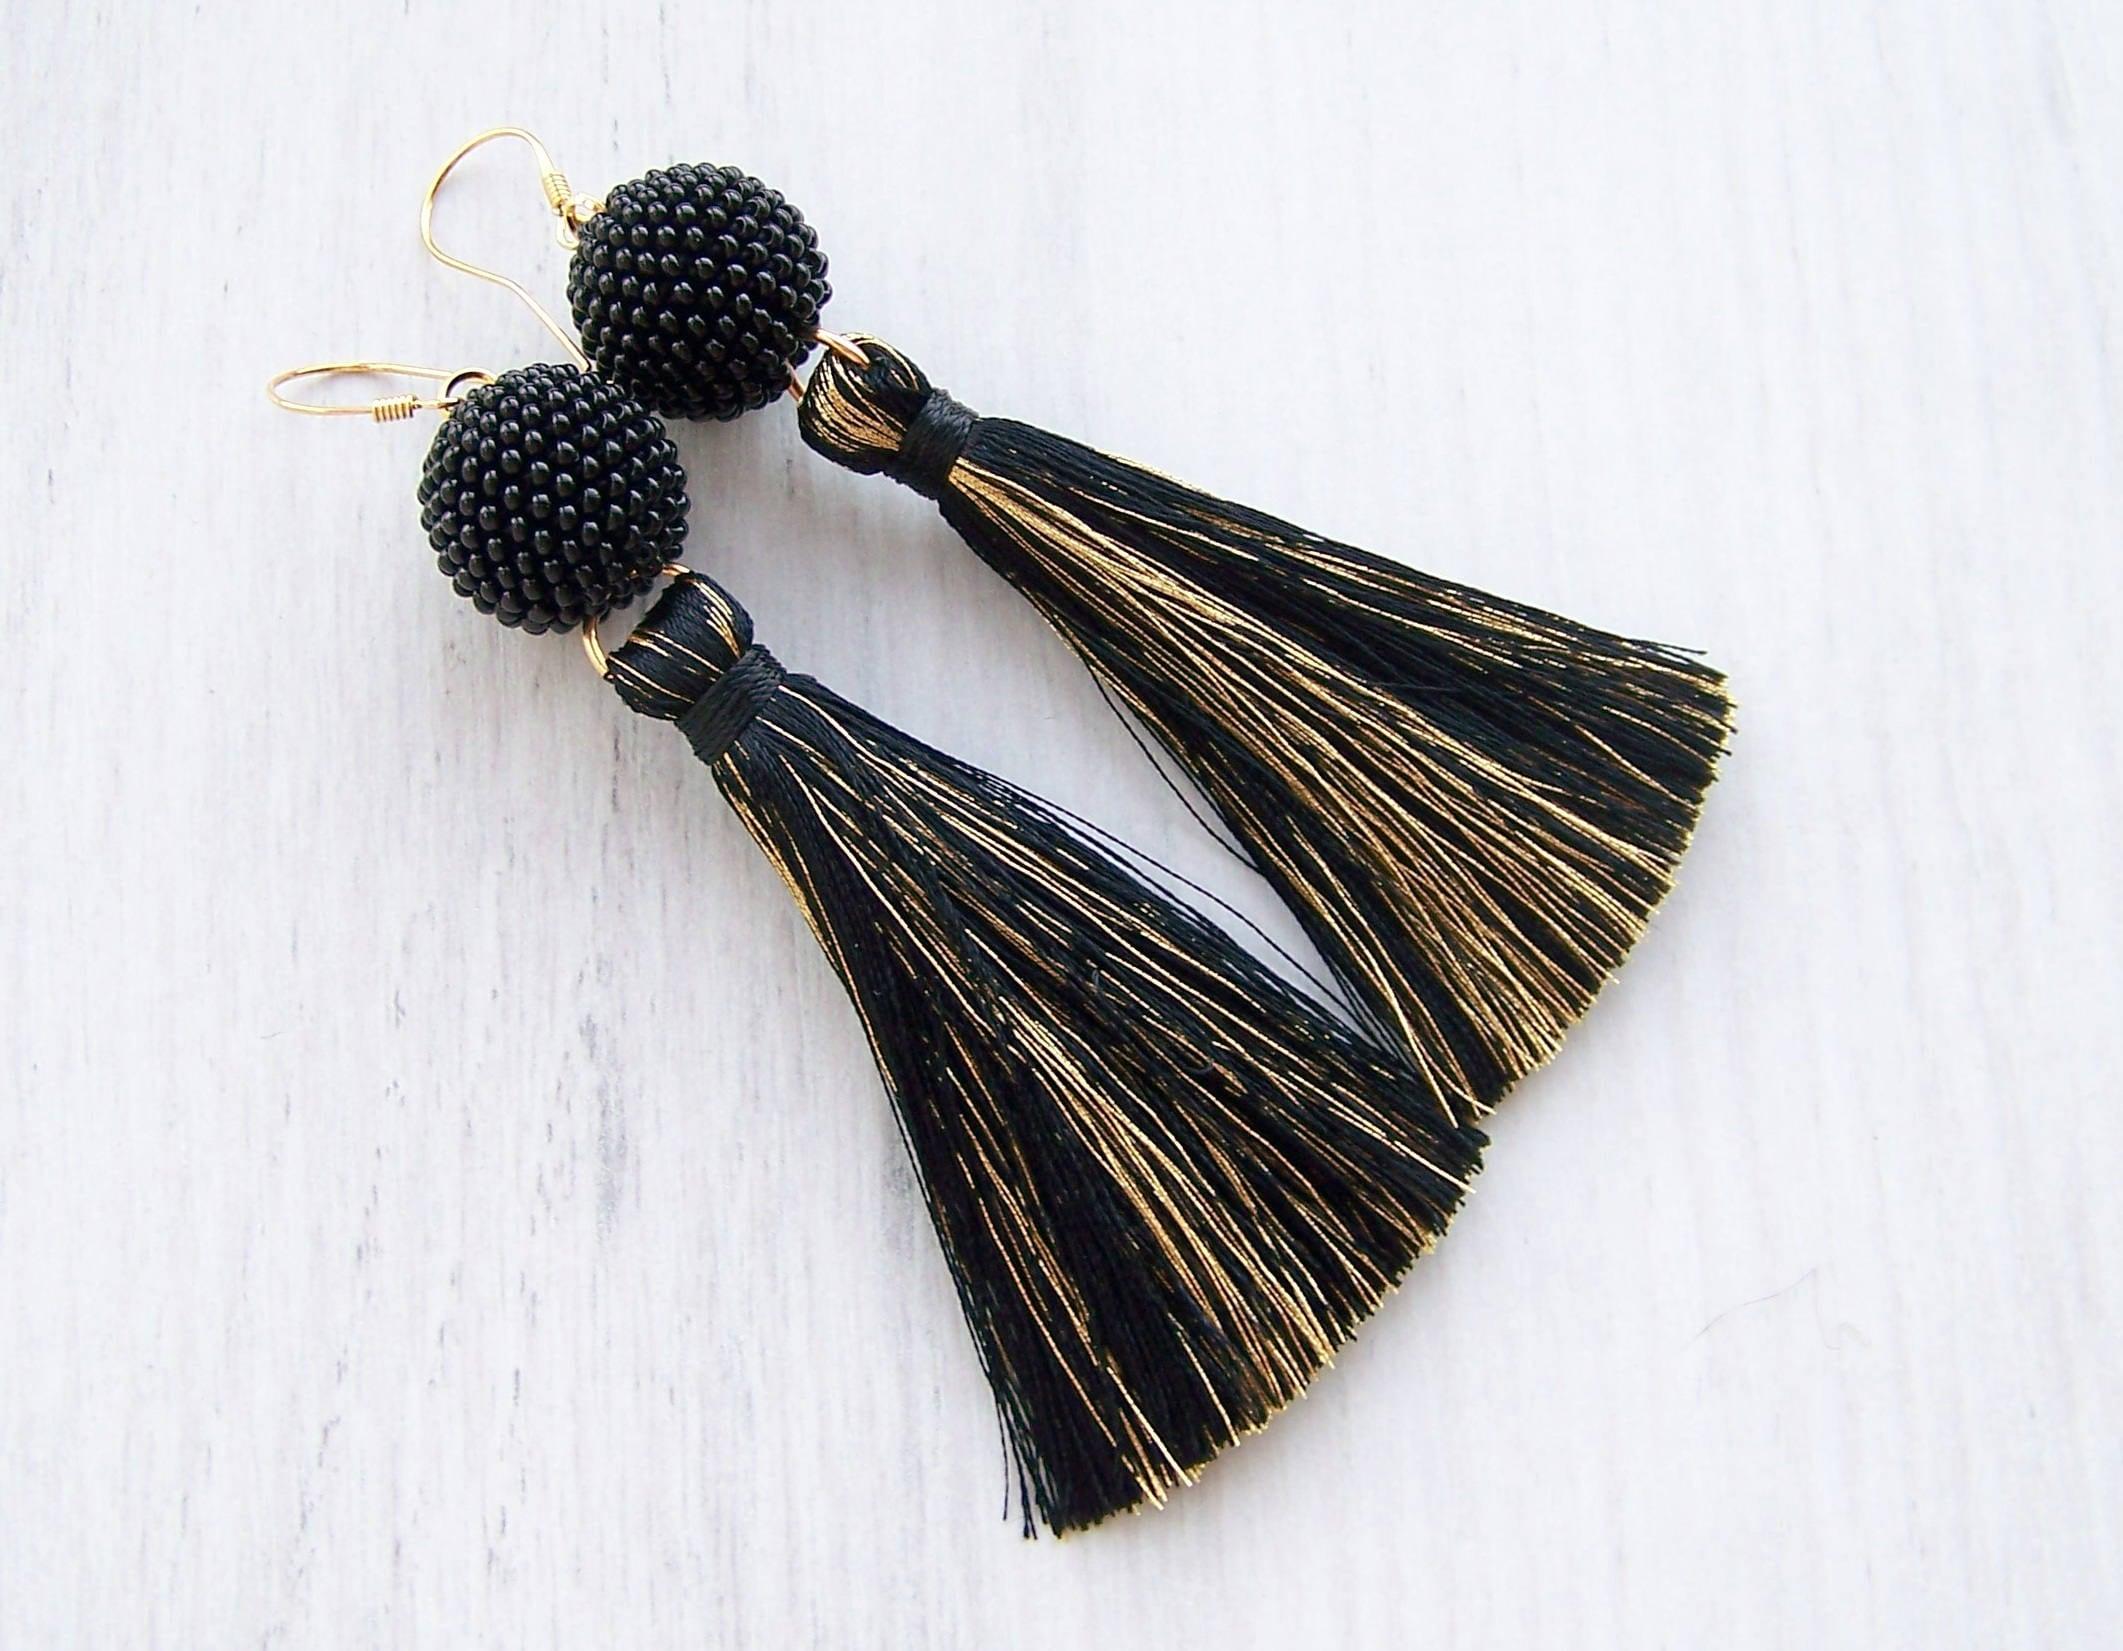 Fringe earrings Lightweight  Dangle long tassle earrings Pink and Gold silk tassel and beaded ball earrings Statement Earrings